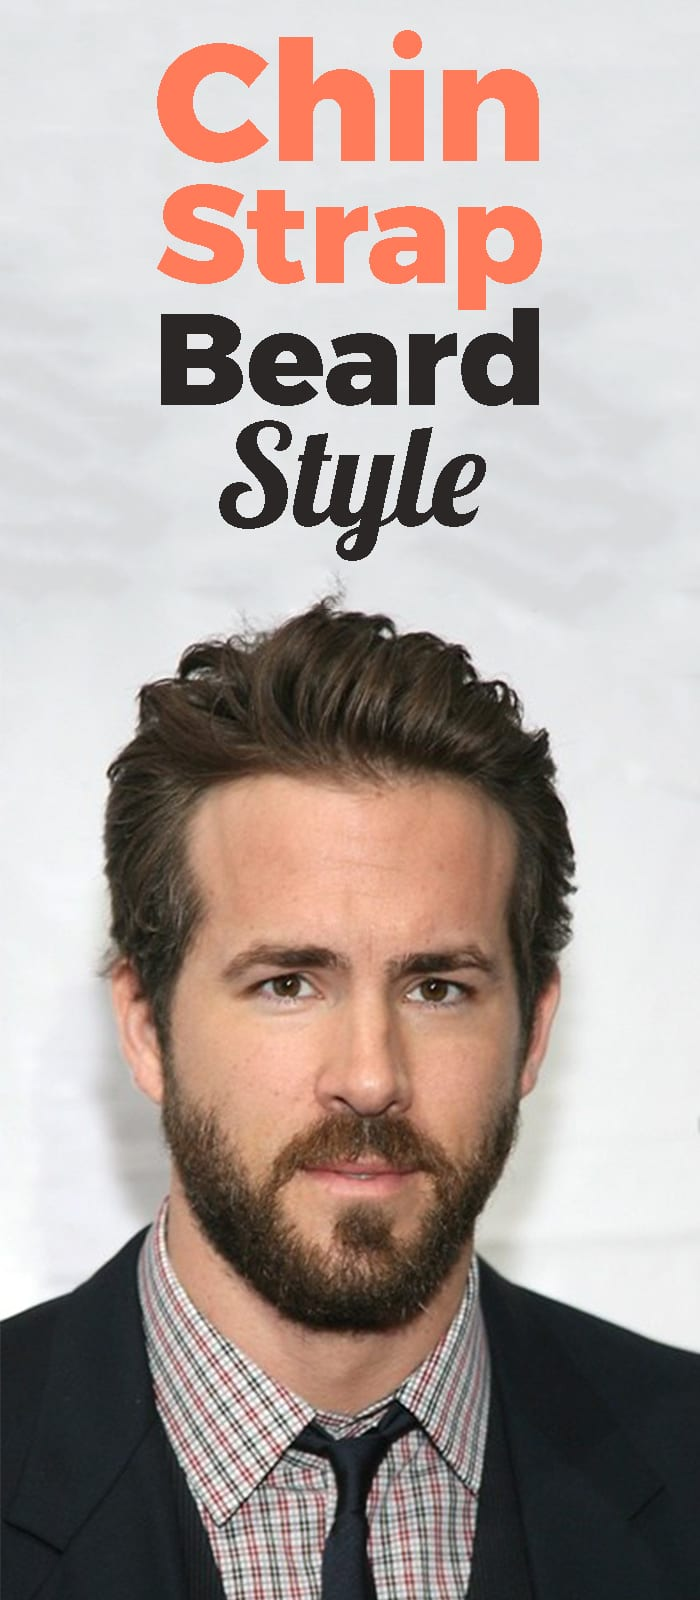 Chin Strip Beard Style